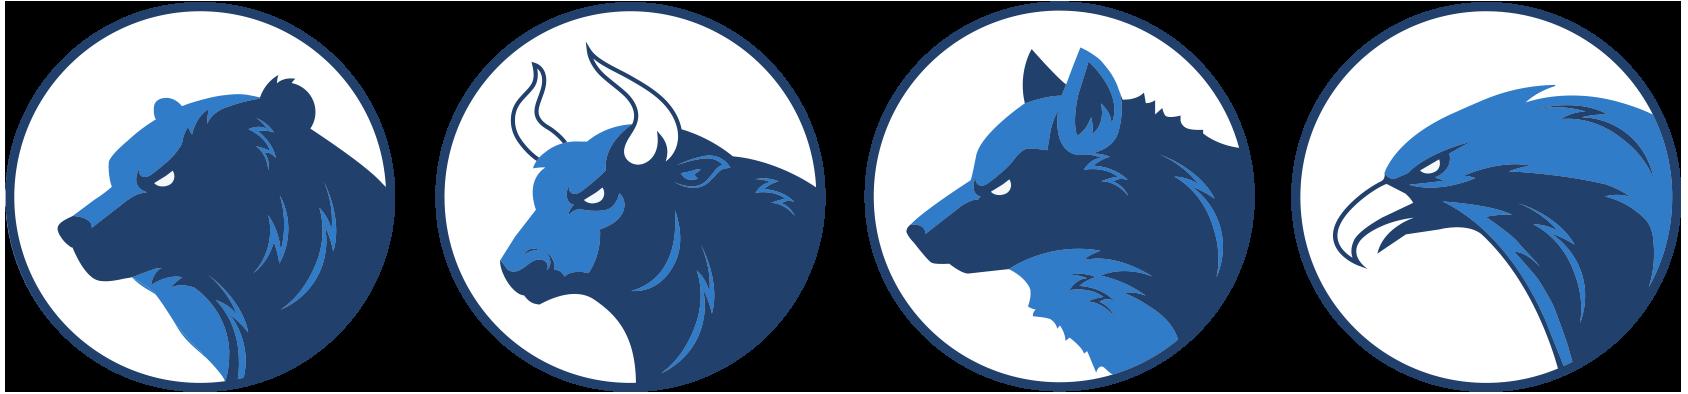 Bear-Bull-Wolf-Eagle-Market-Icons